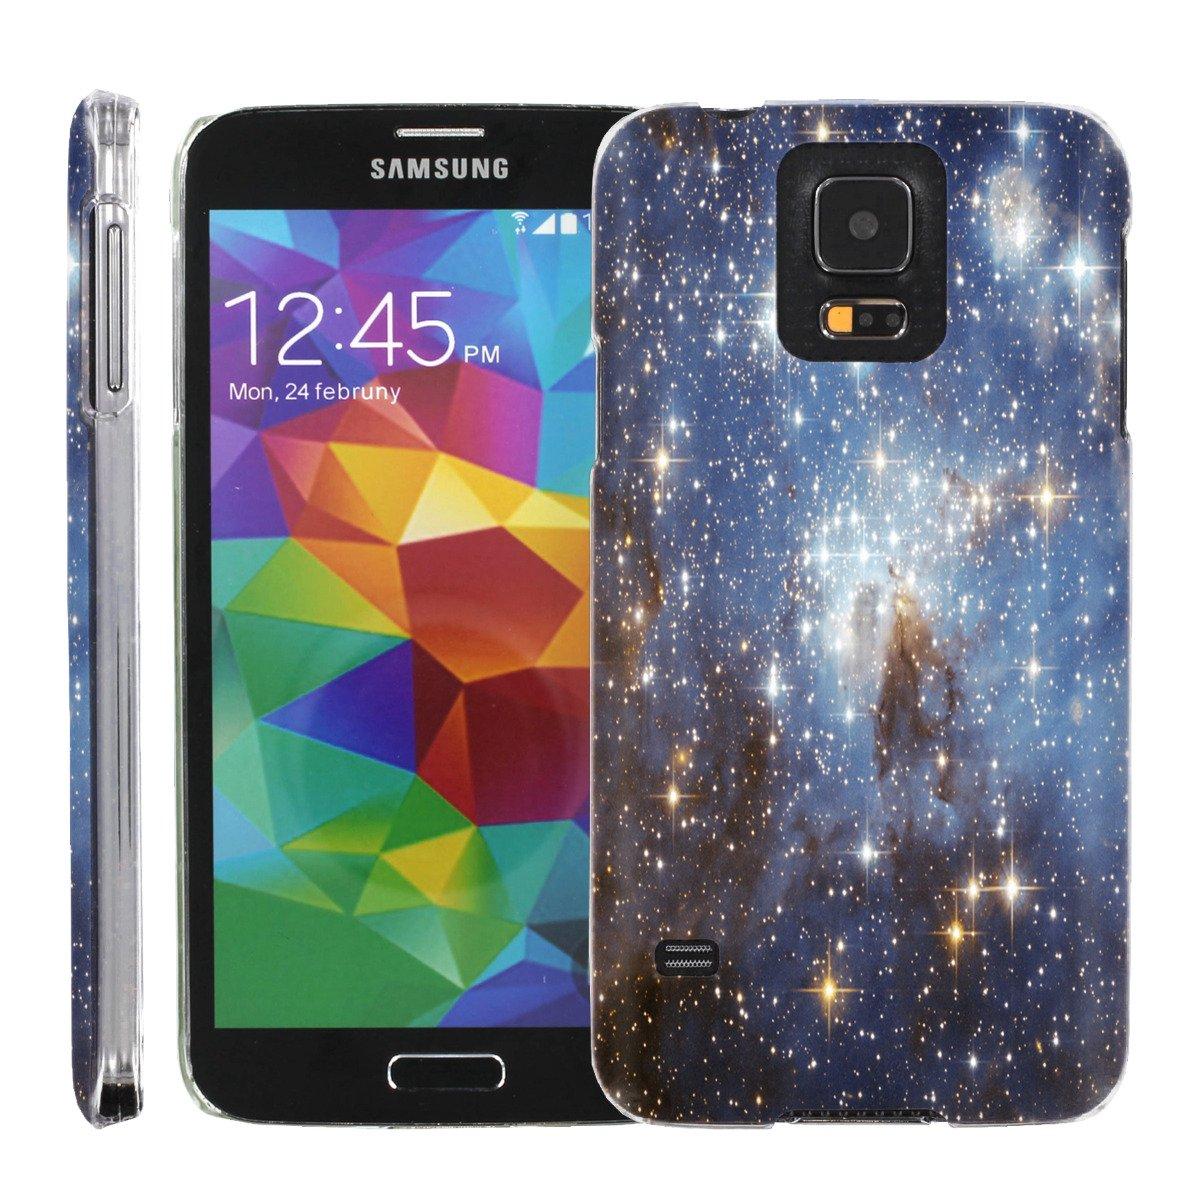 [ManiaGear] [ULTRA SLIM] Clip On Grephic Deisign Case (Stars Light) for Samsung Galaxy S5 S 5